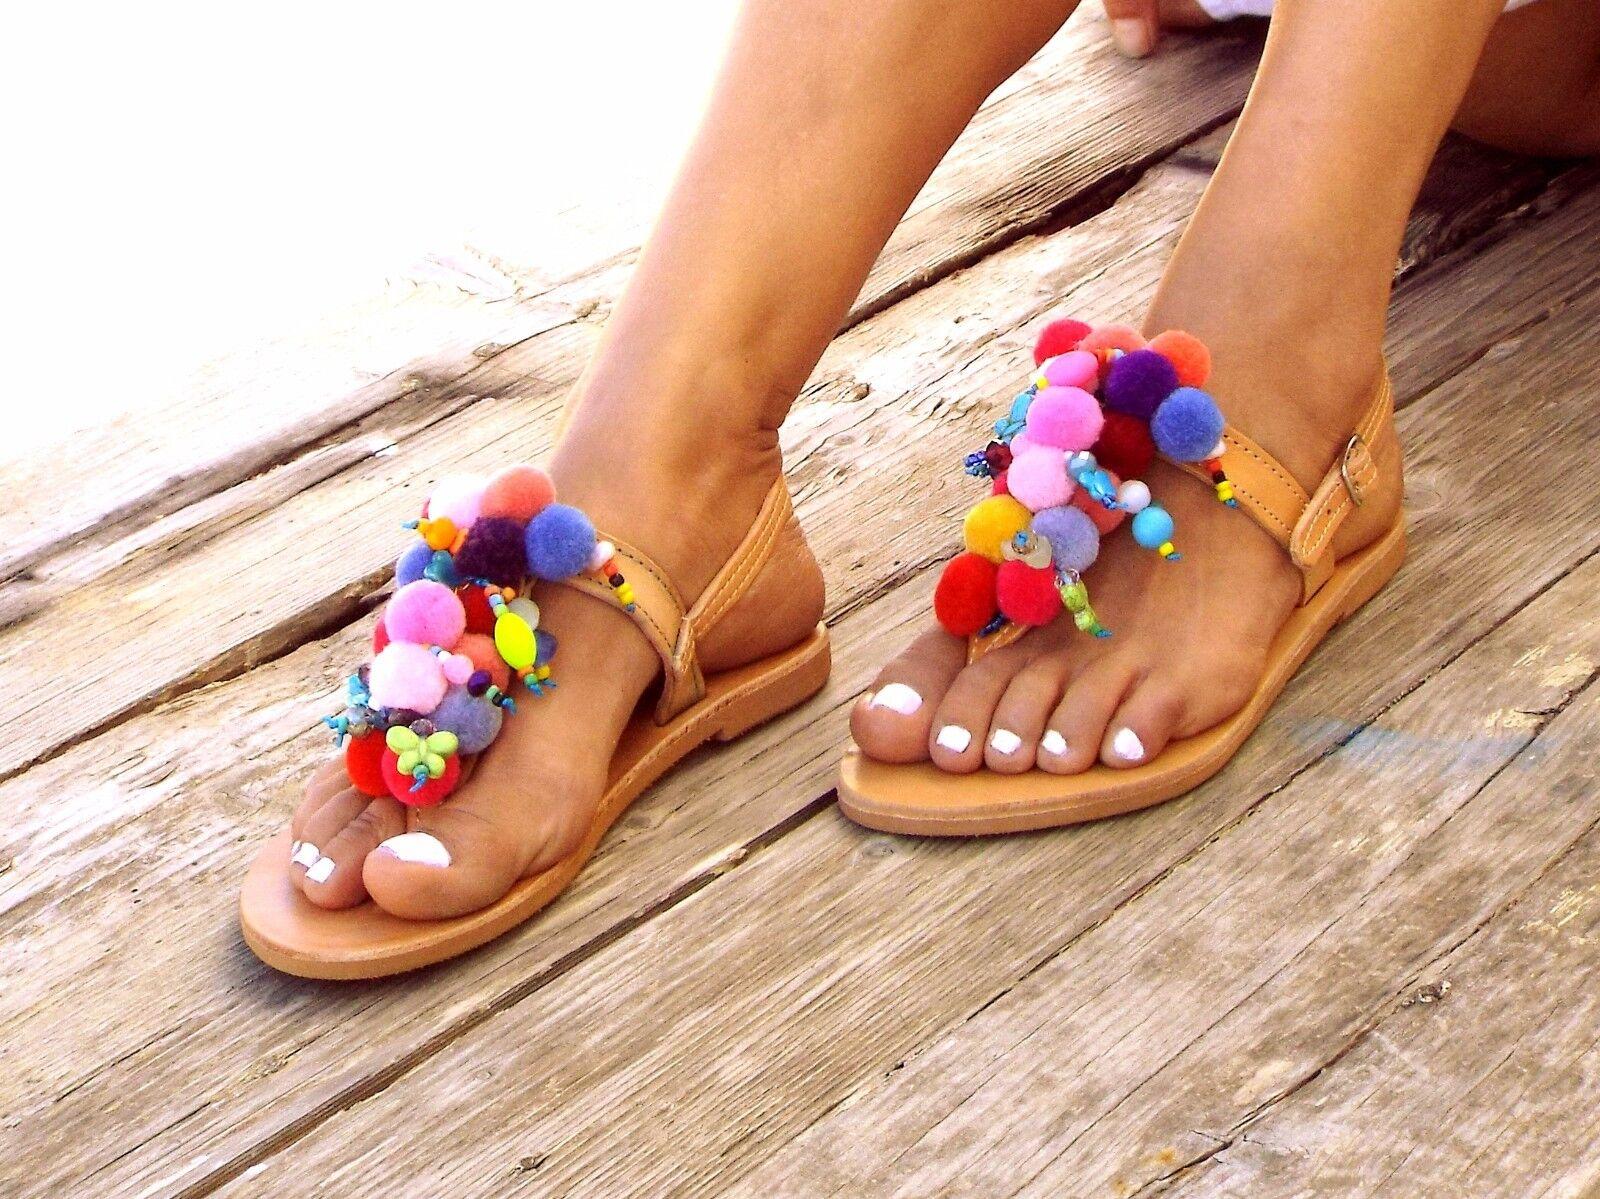 Alkioni, Pom Pom sandals, Handmade leather sandals, T-strap sandals, boho sandal